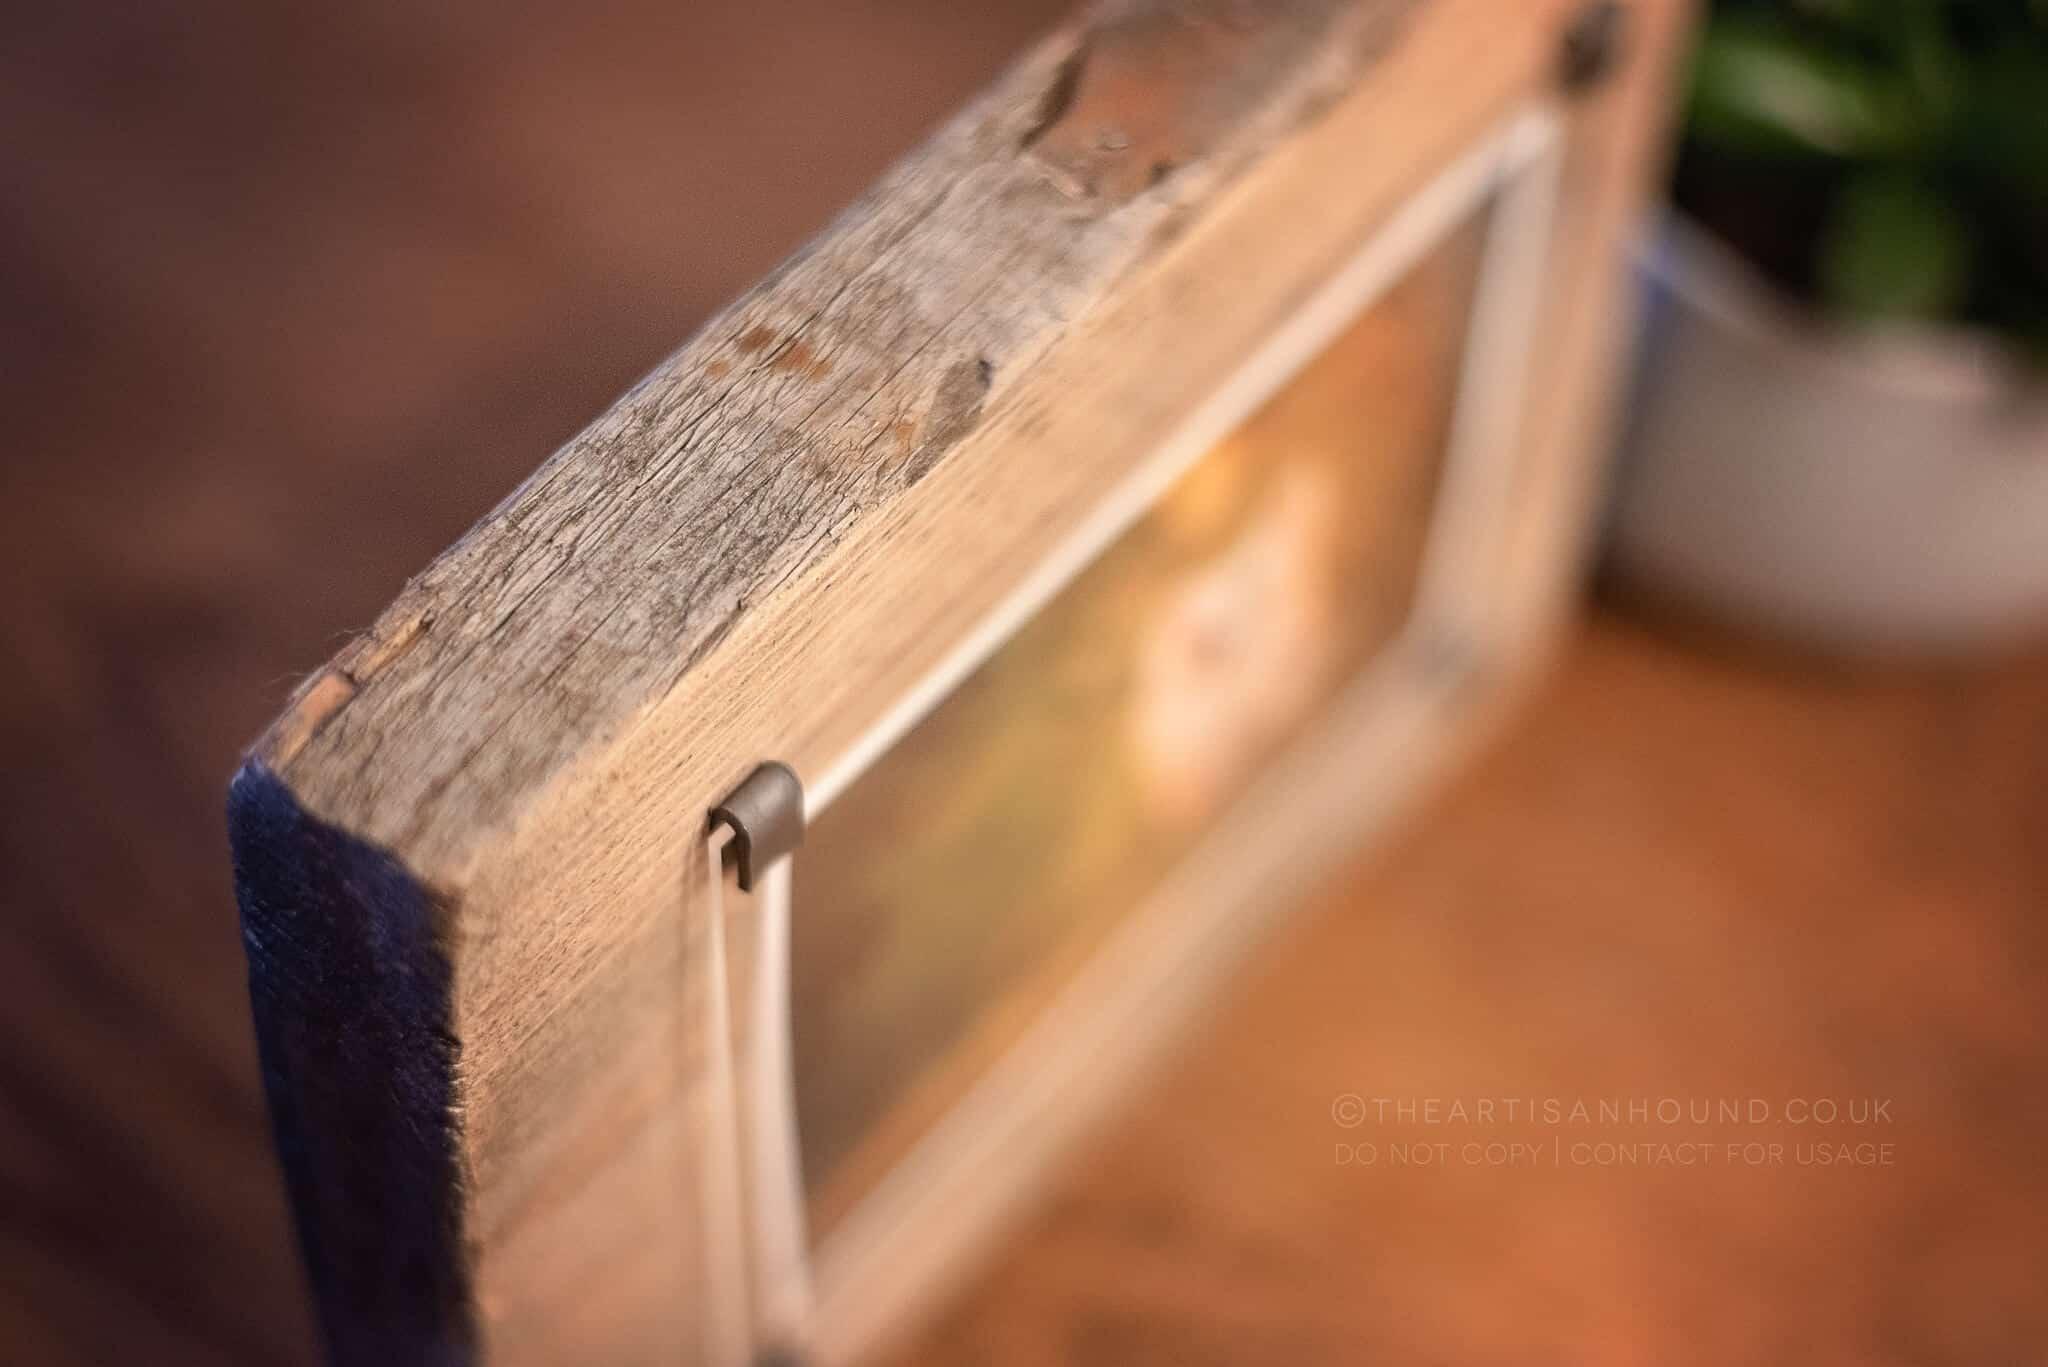 detail-of-wood-grain-on-photo-frame